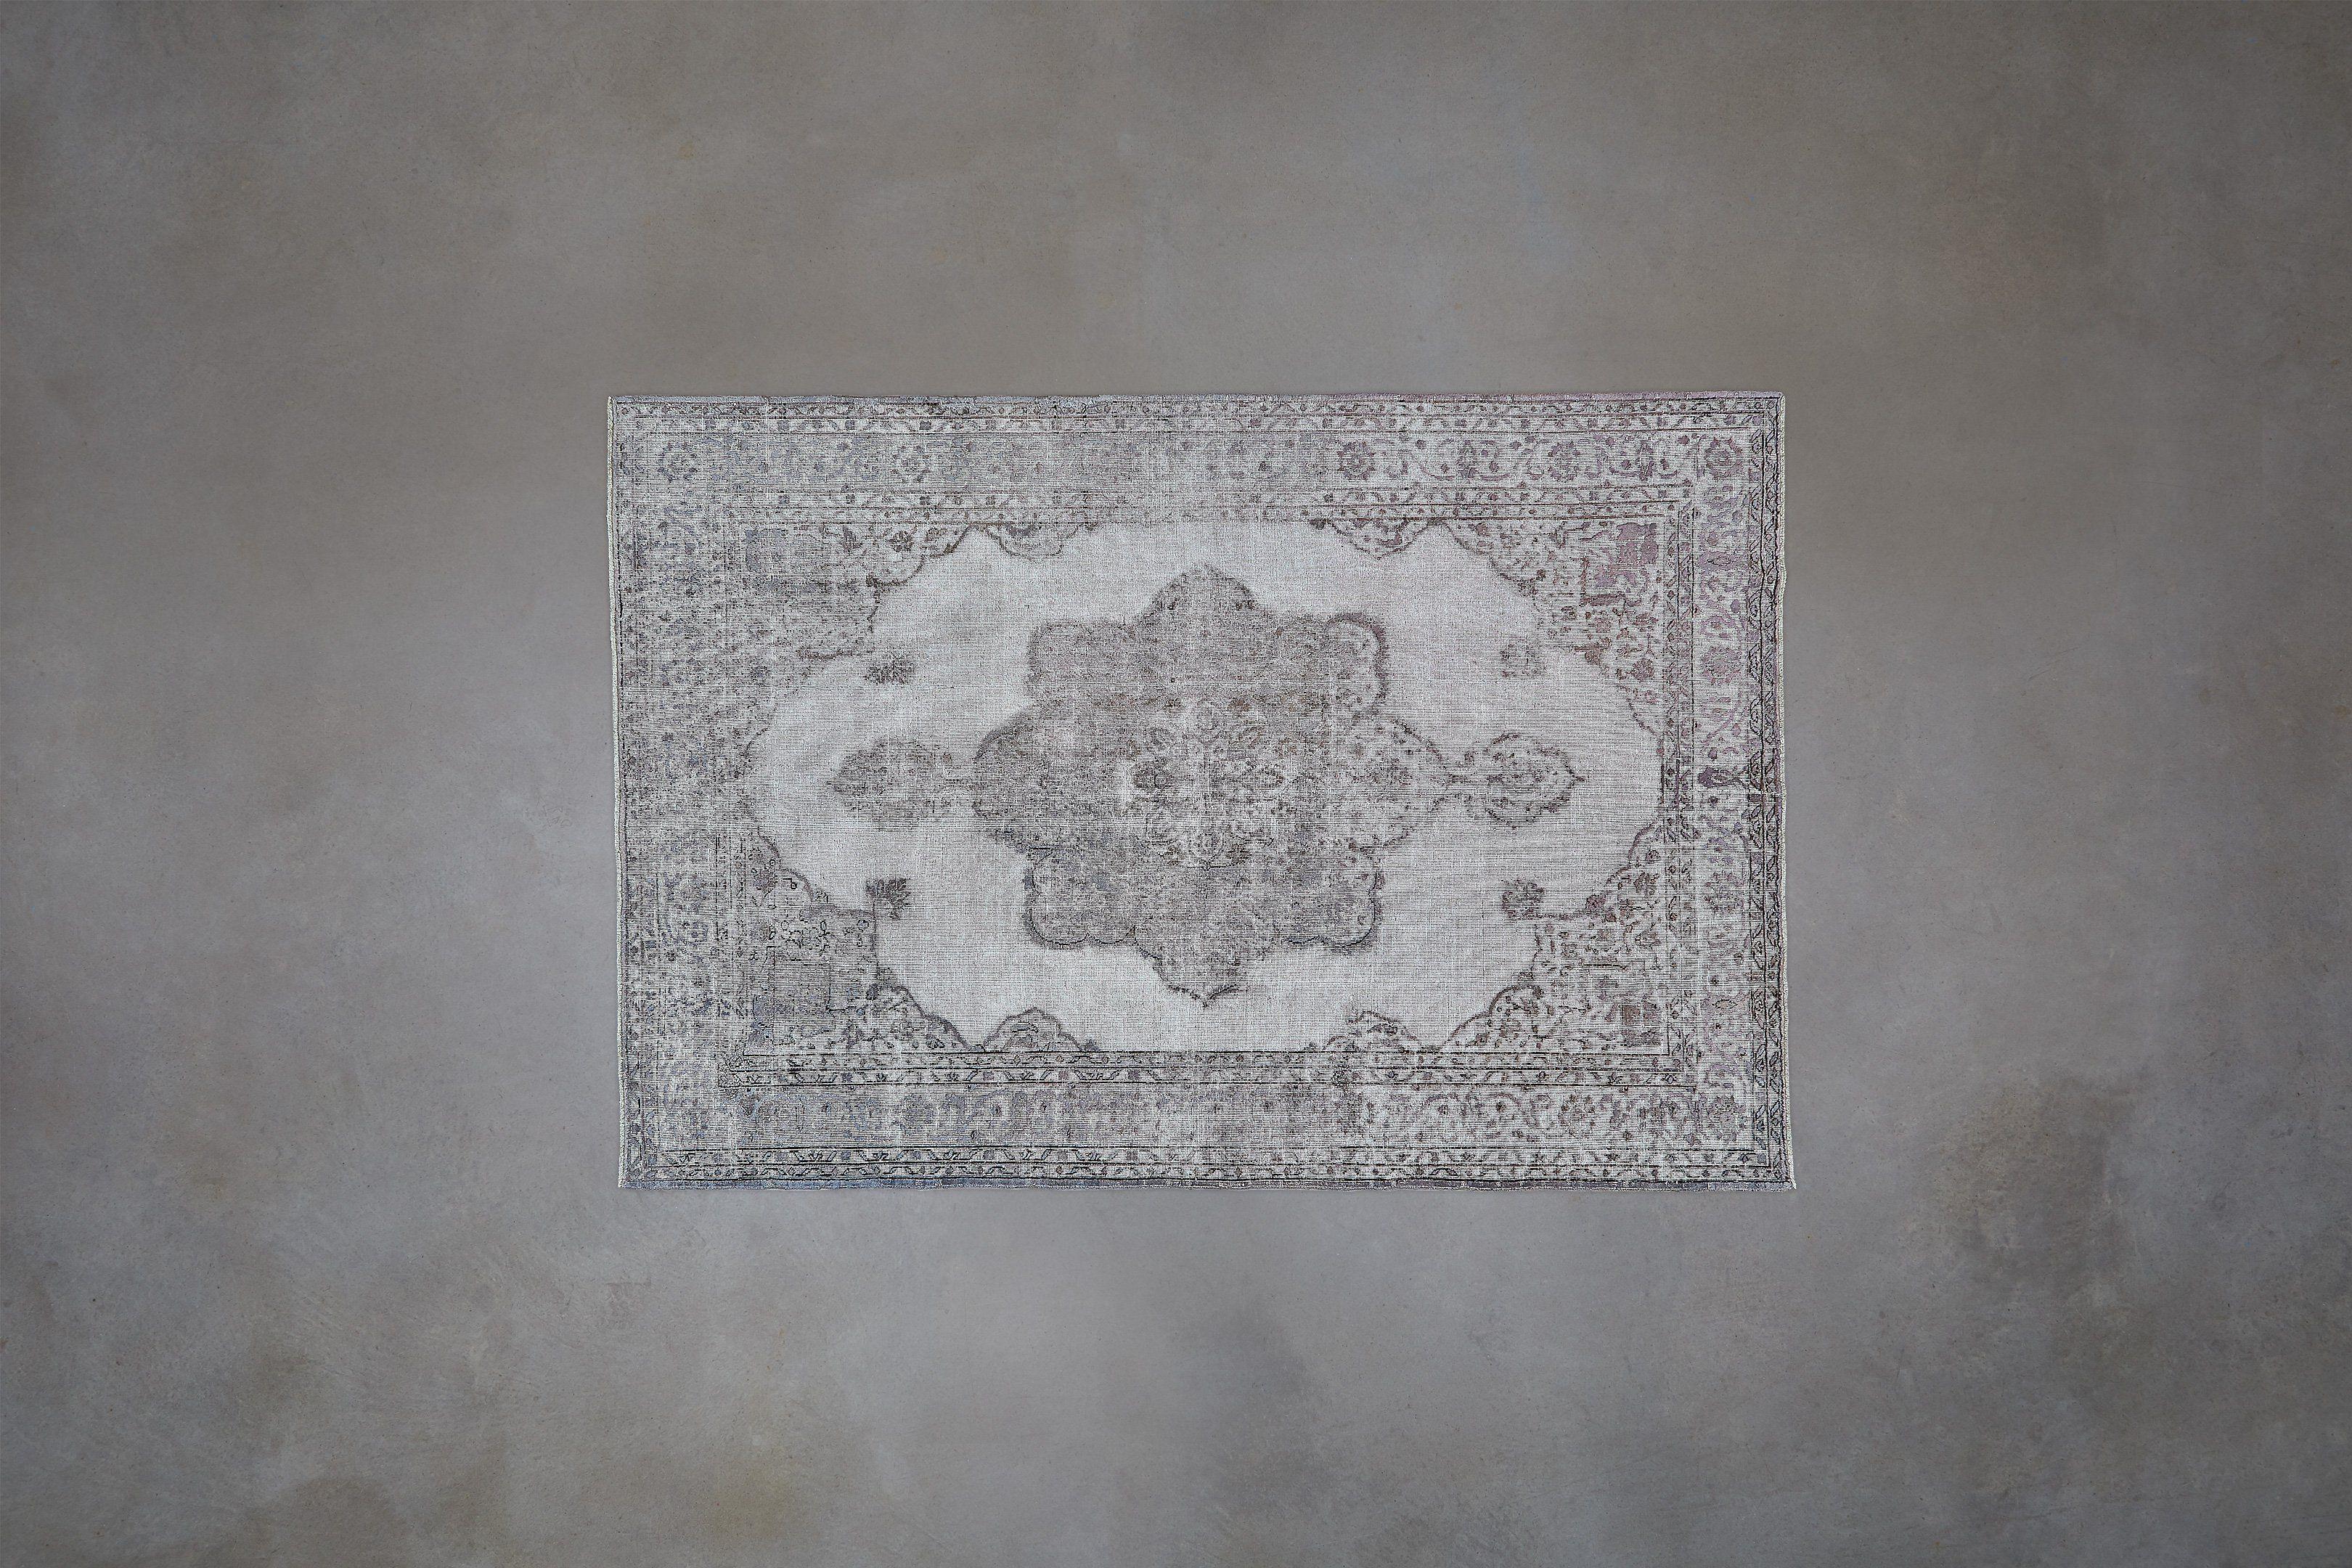 overdye  madison lily modern rugs houston  eyler ca  pinterest - overdye  madison lily modern rugs houston